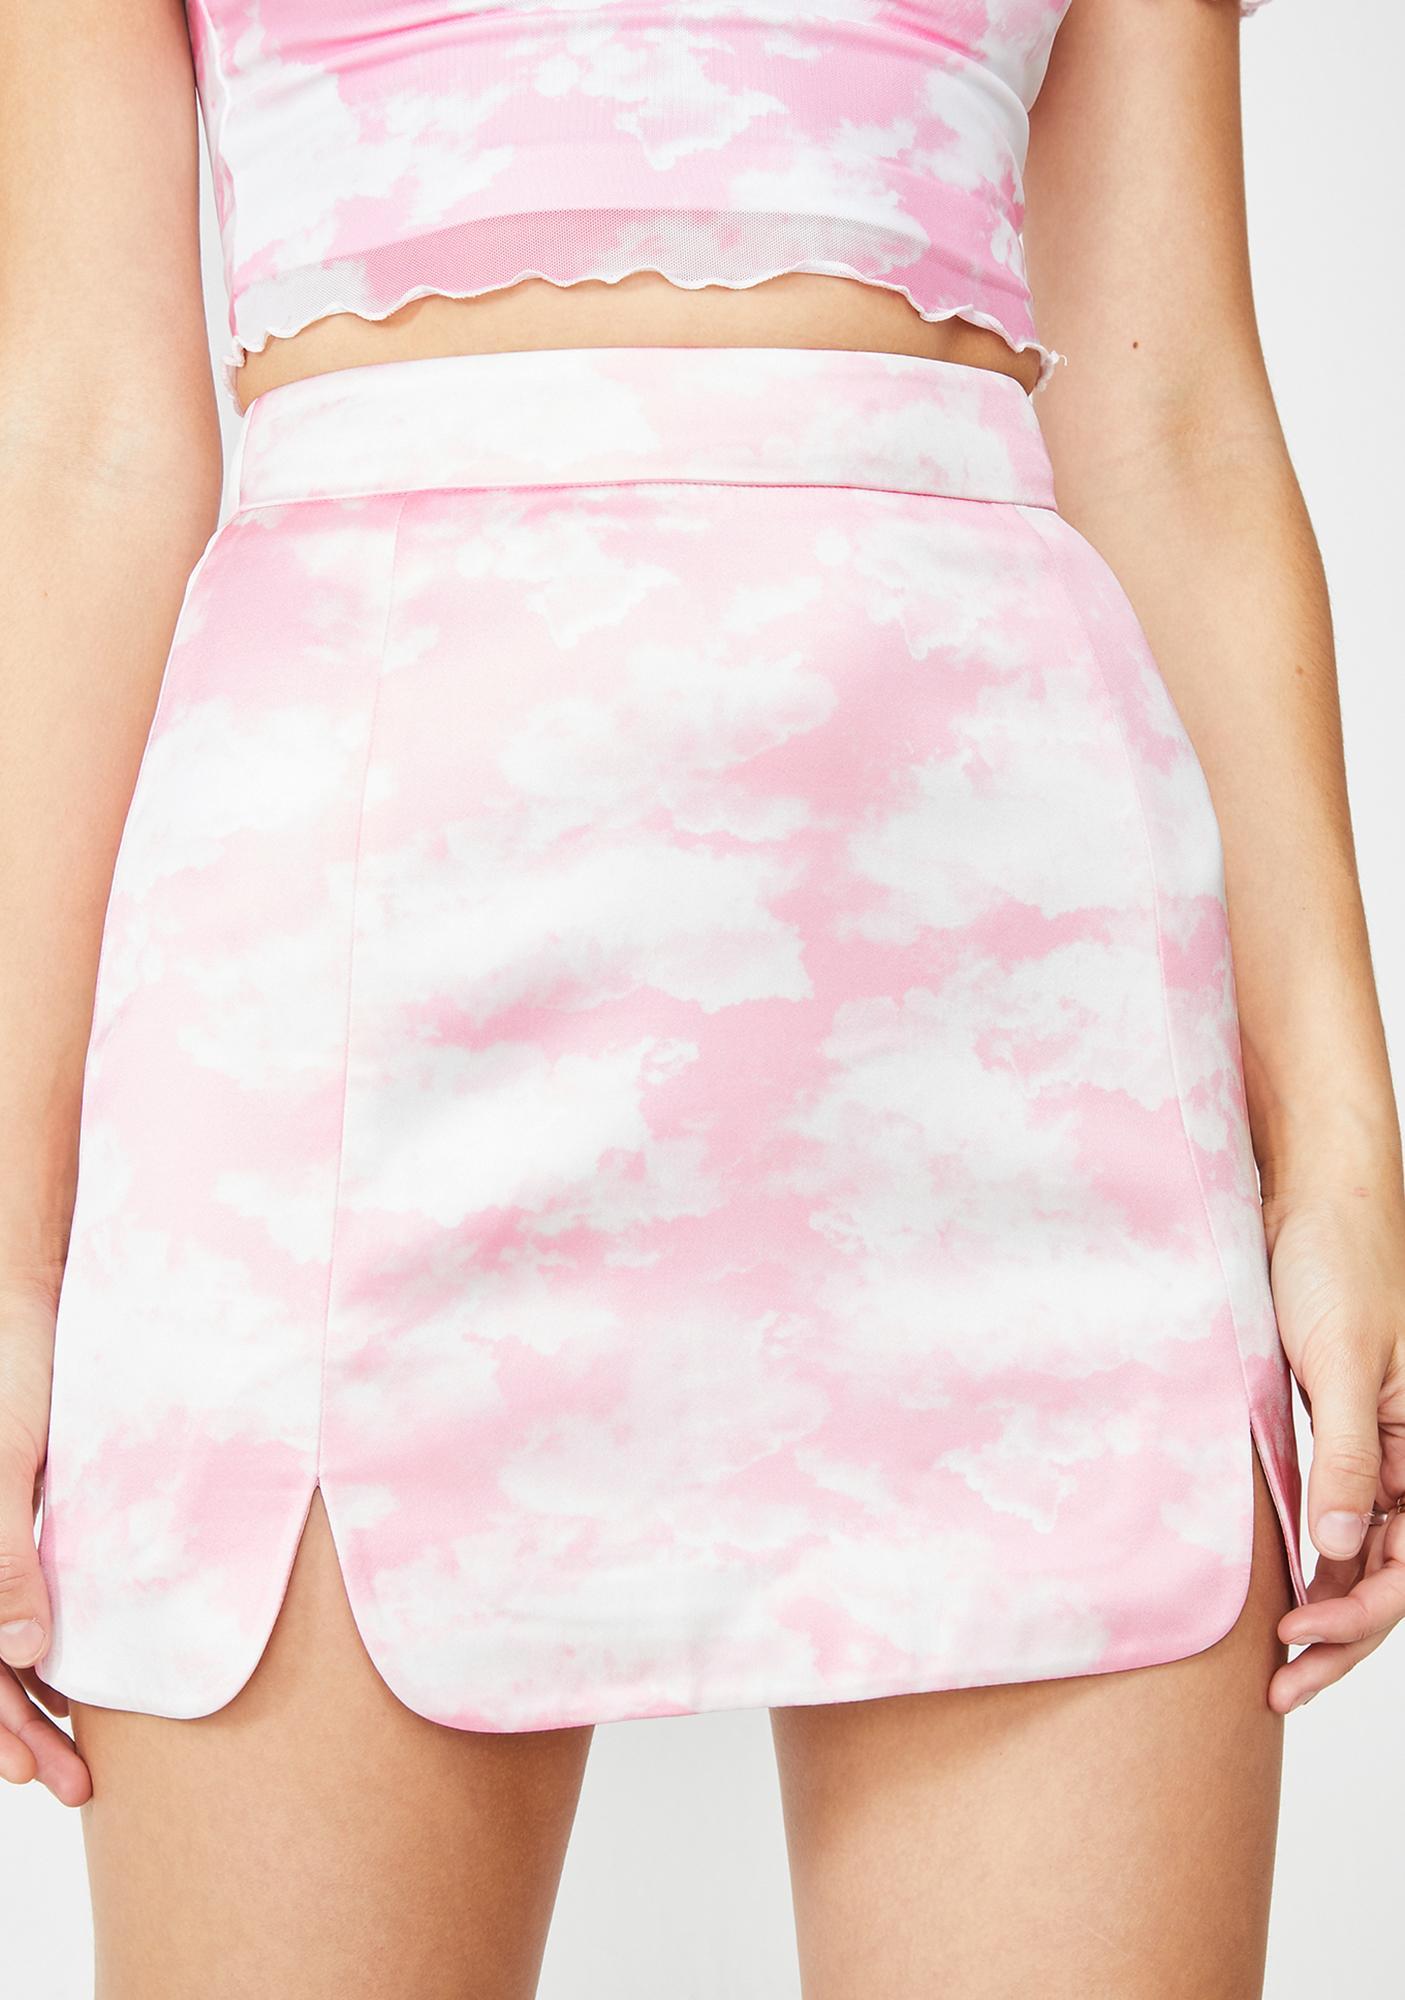 870571725b Sugar Thrillz Bliss Vision Satin Skirt | Dolls Kill